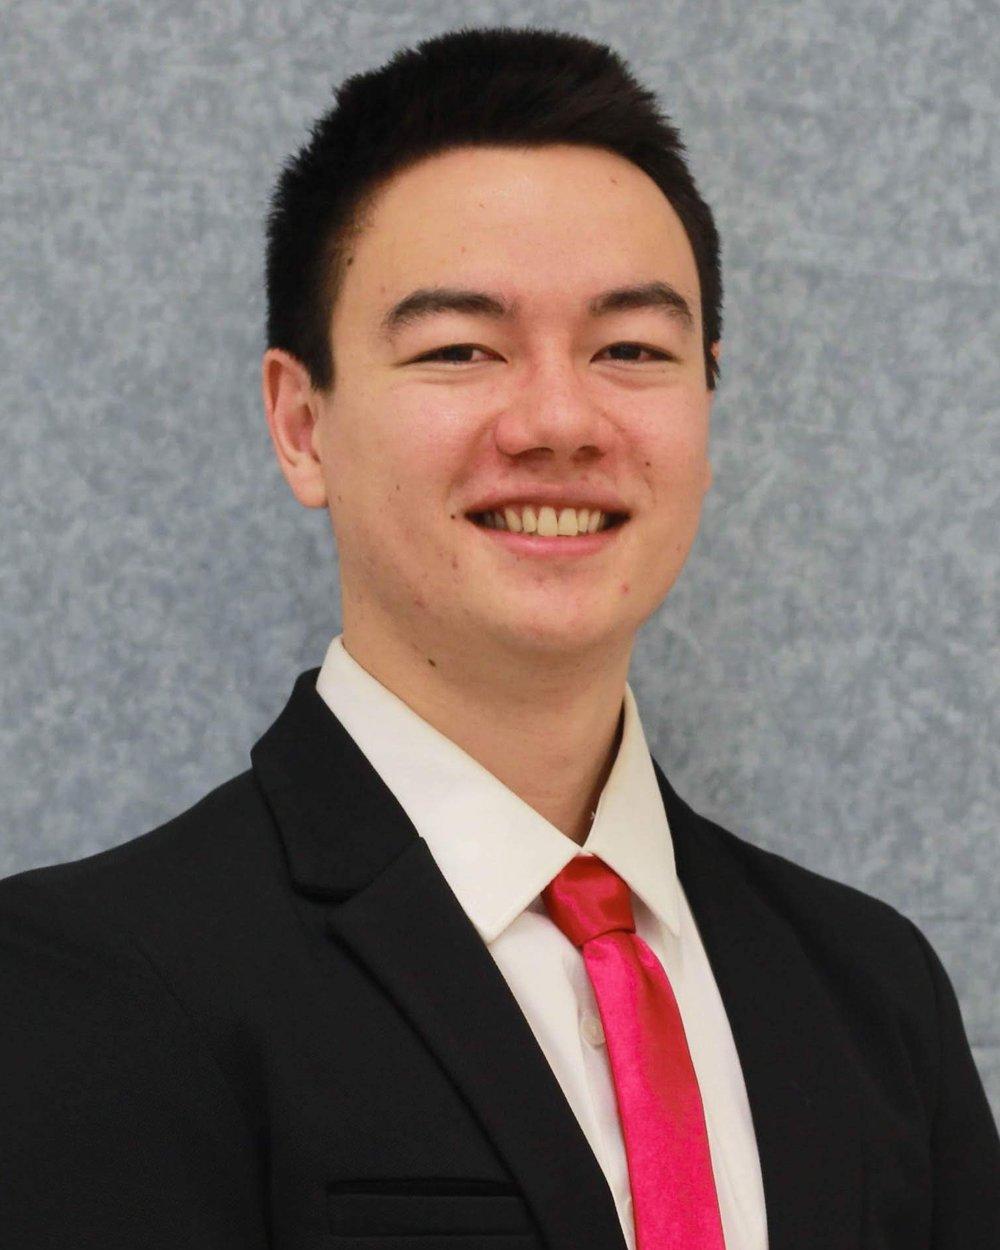 Chris Lojewski - Academic Chair